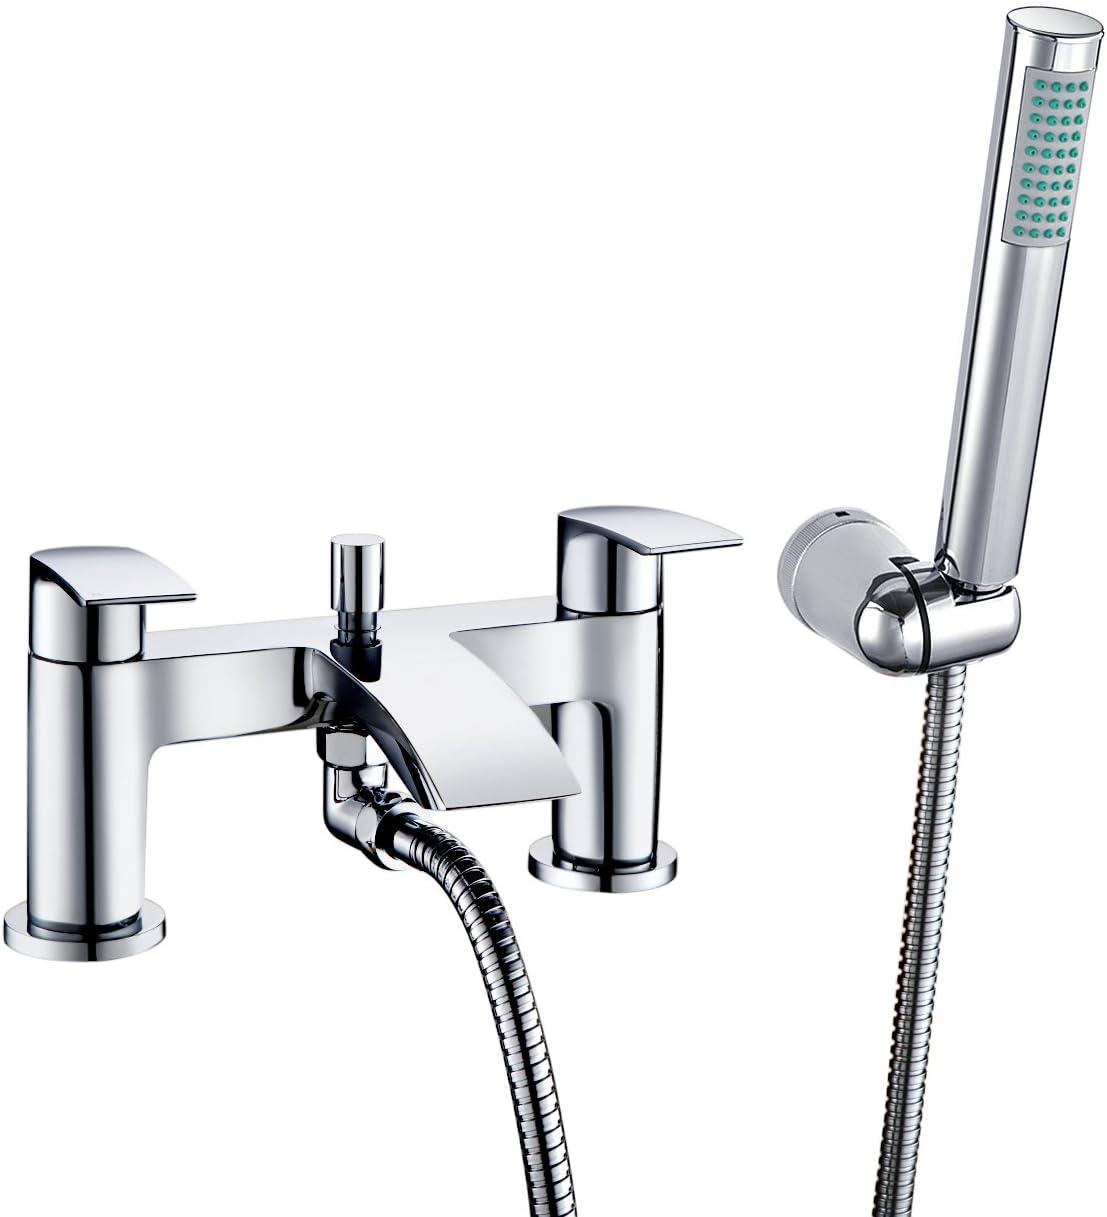 [Bath Shower Tap] Hapilife Bathroom Watefall Double Handle Mixer Monobloc Tap with Handheld Shower Head Chrome